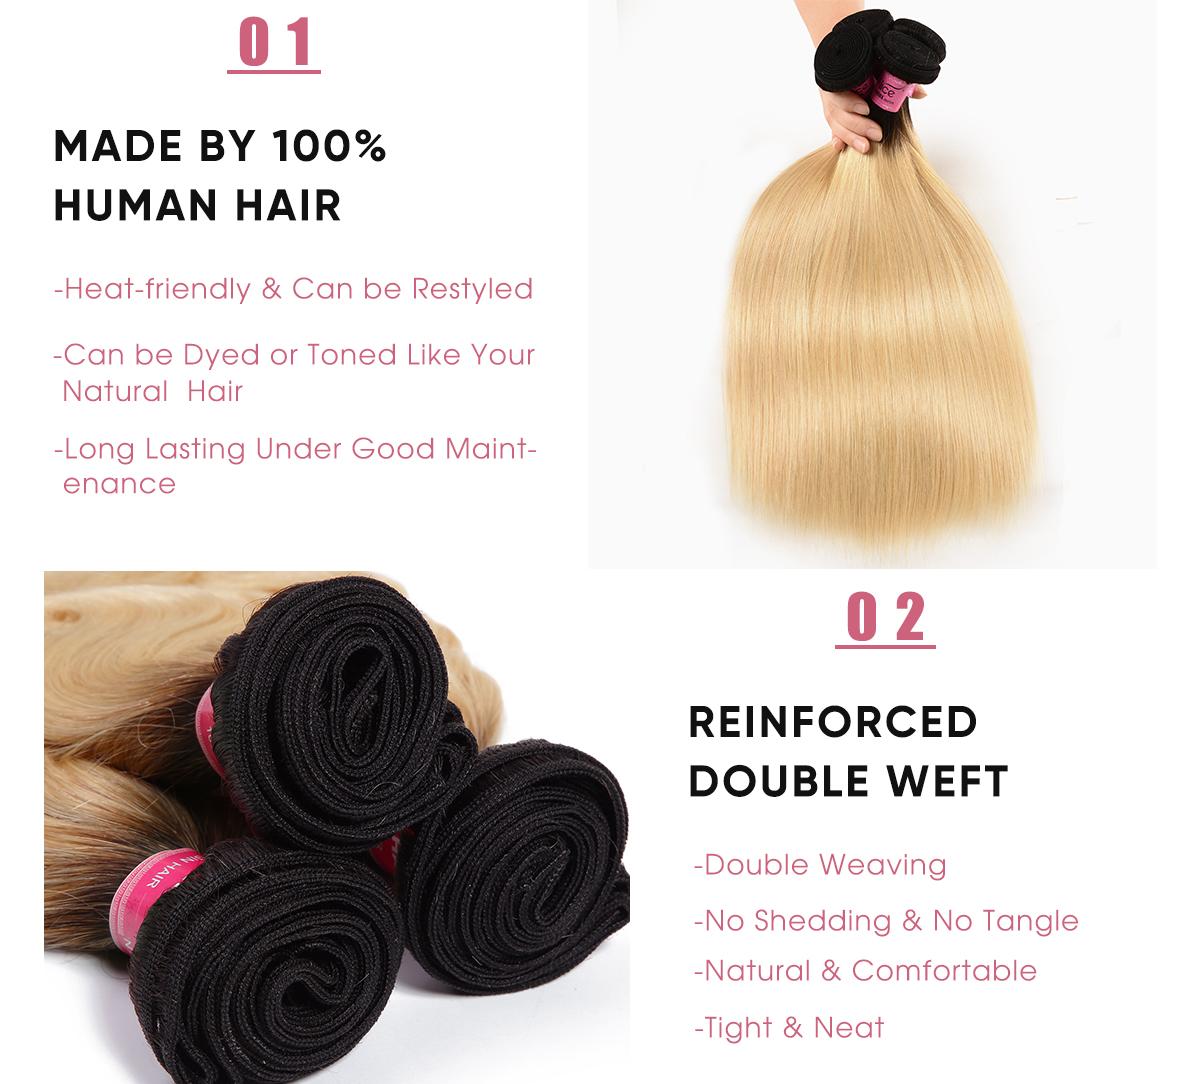 Straight Cheap 3 Pcs Human Hair Bundles 1B/613 Ombre